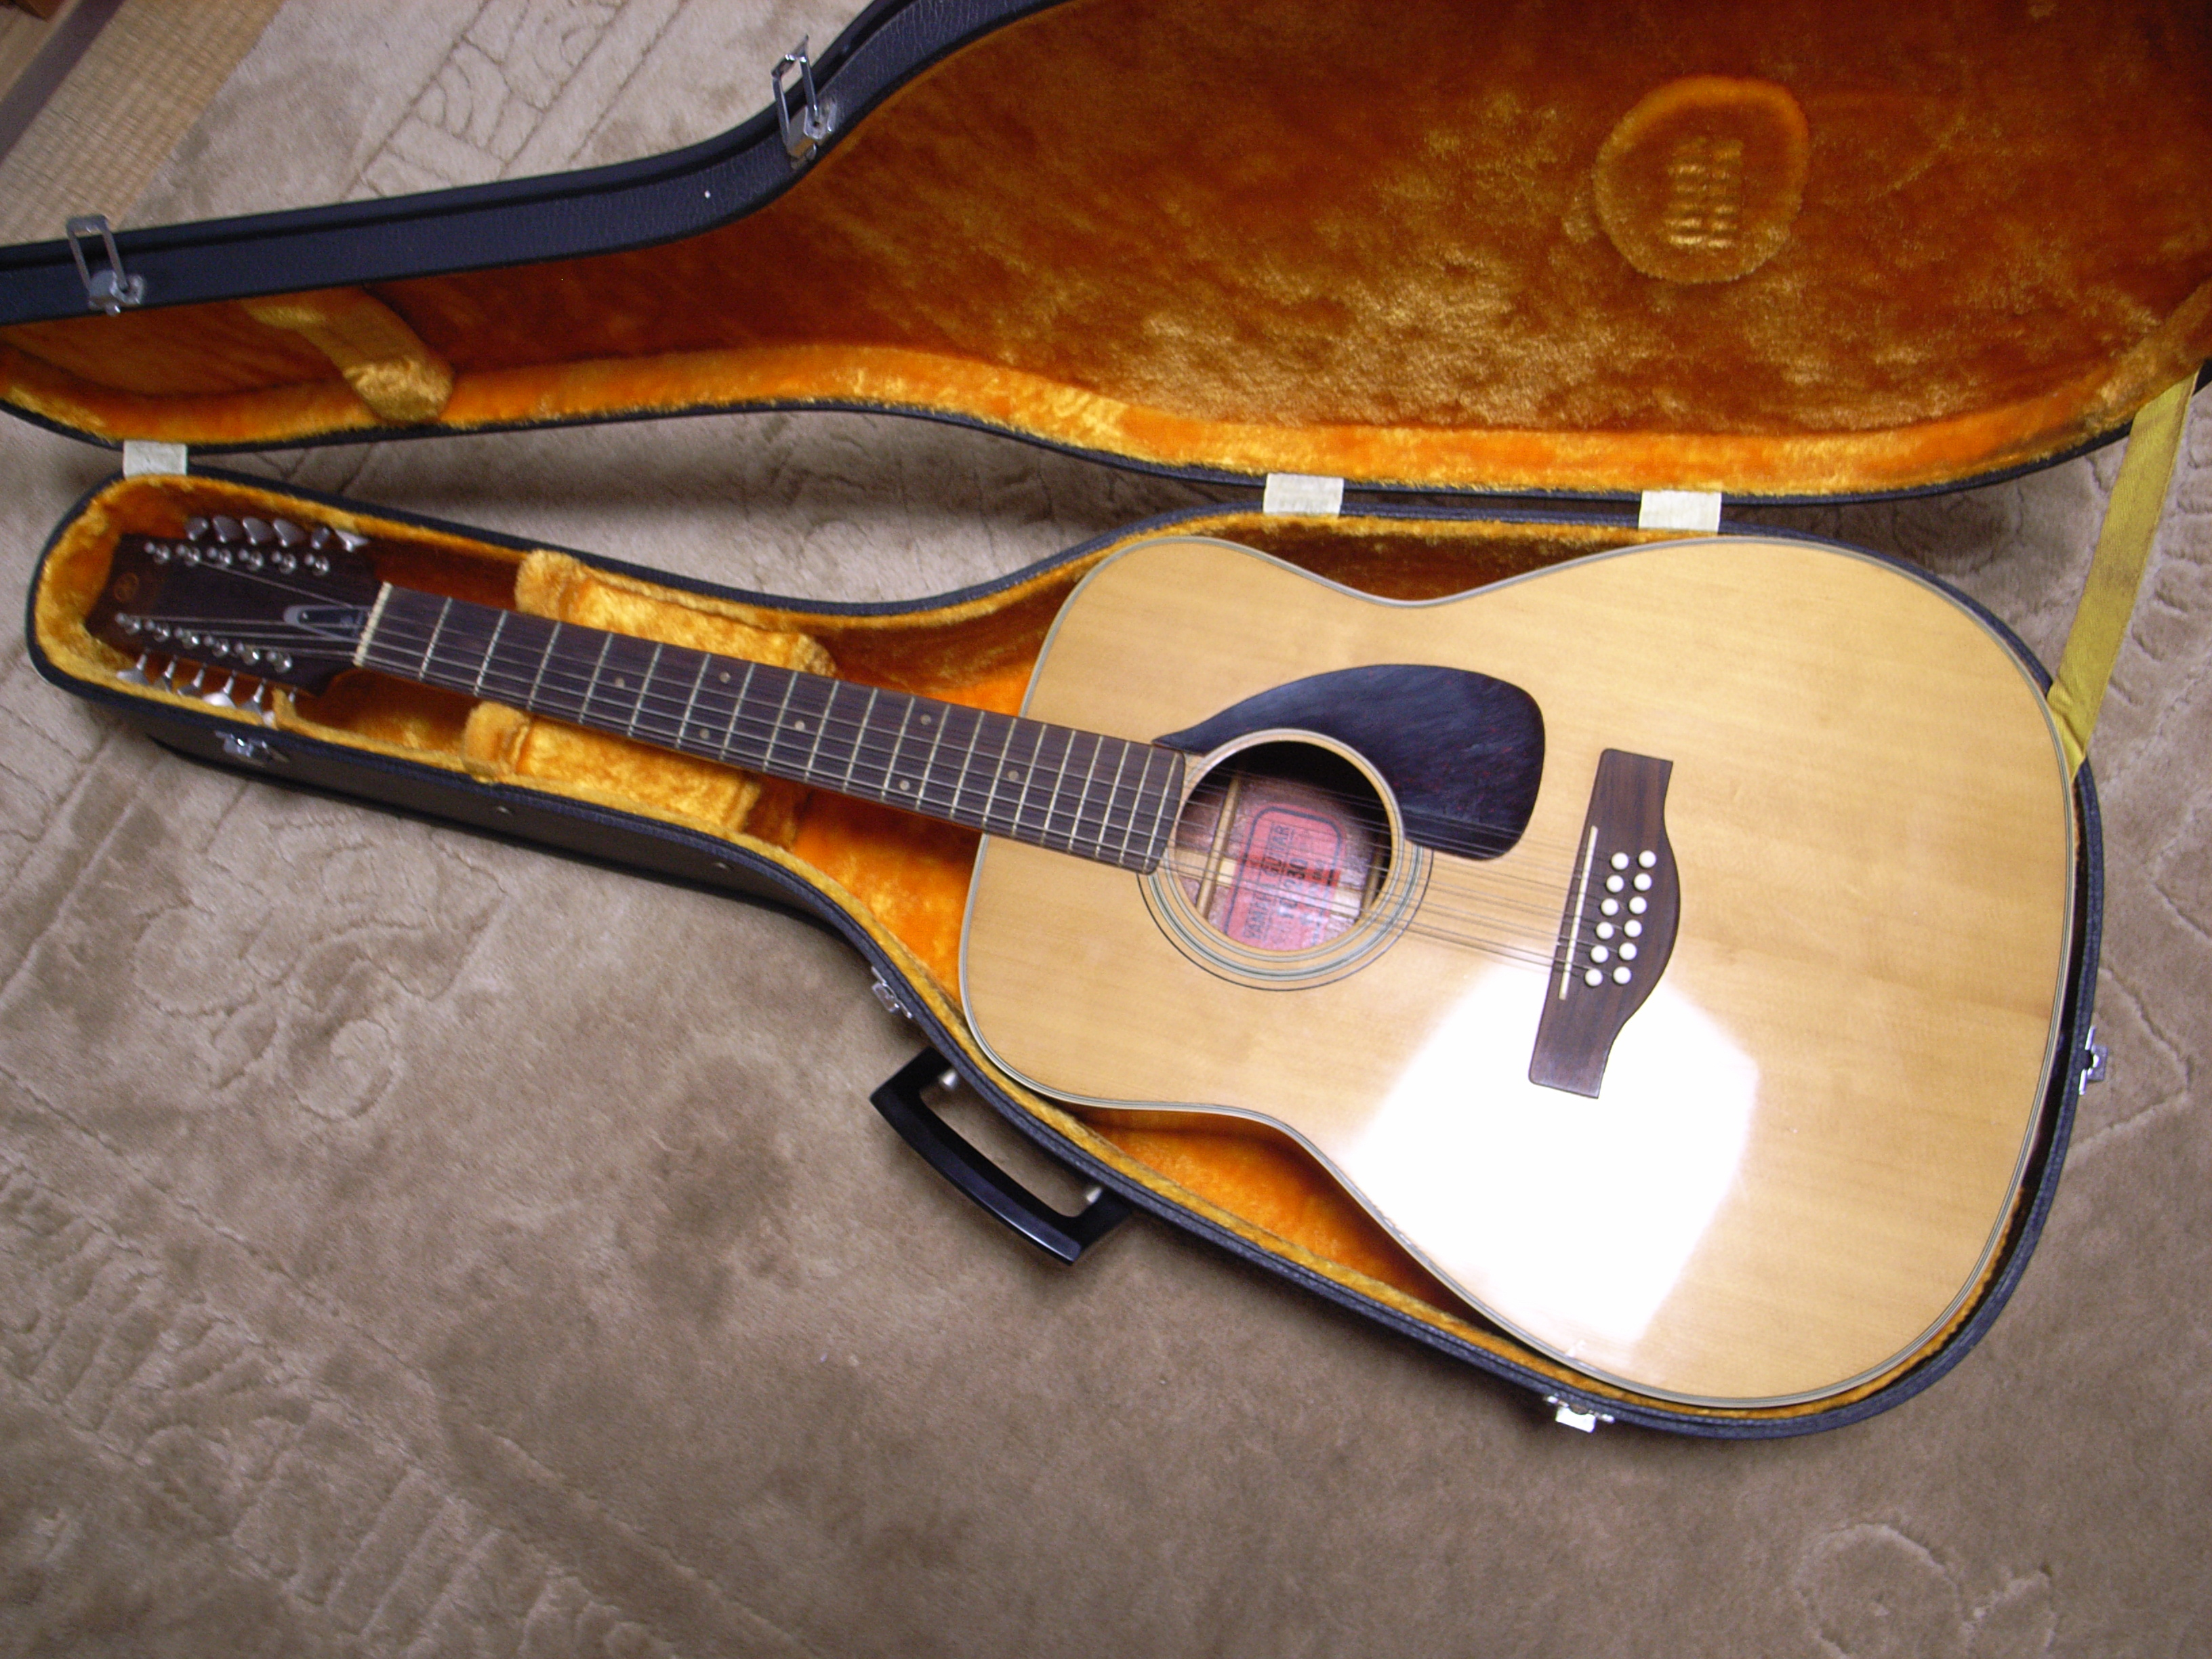 Yamaha Guitars For Sale South Africa